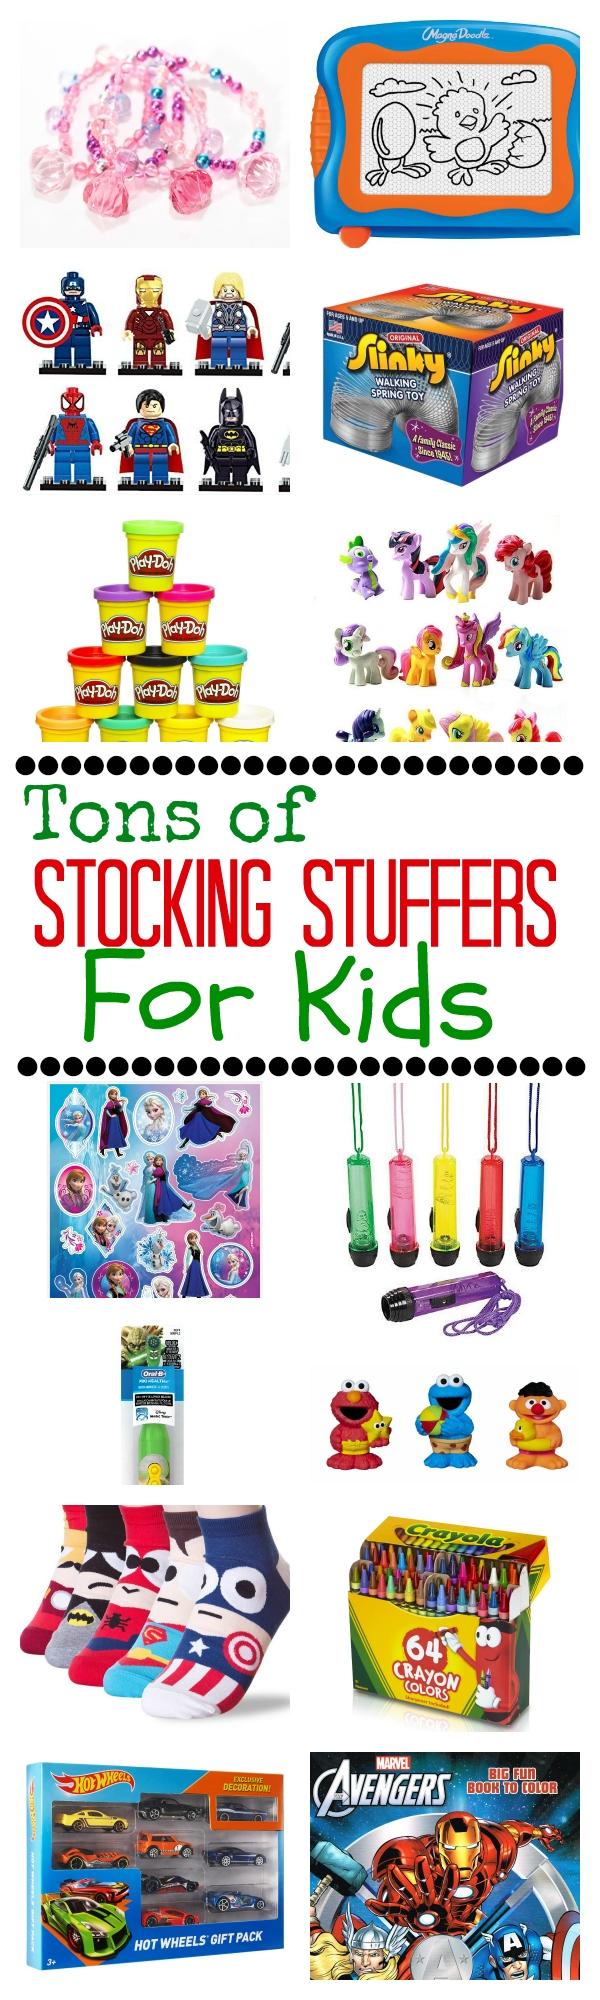 10 Wonderful Stocking Stuffer Ideas For Girlfriend huge stocking stuffer ideas list crazy little projects 1